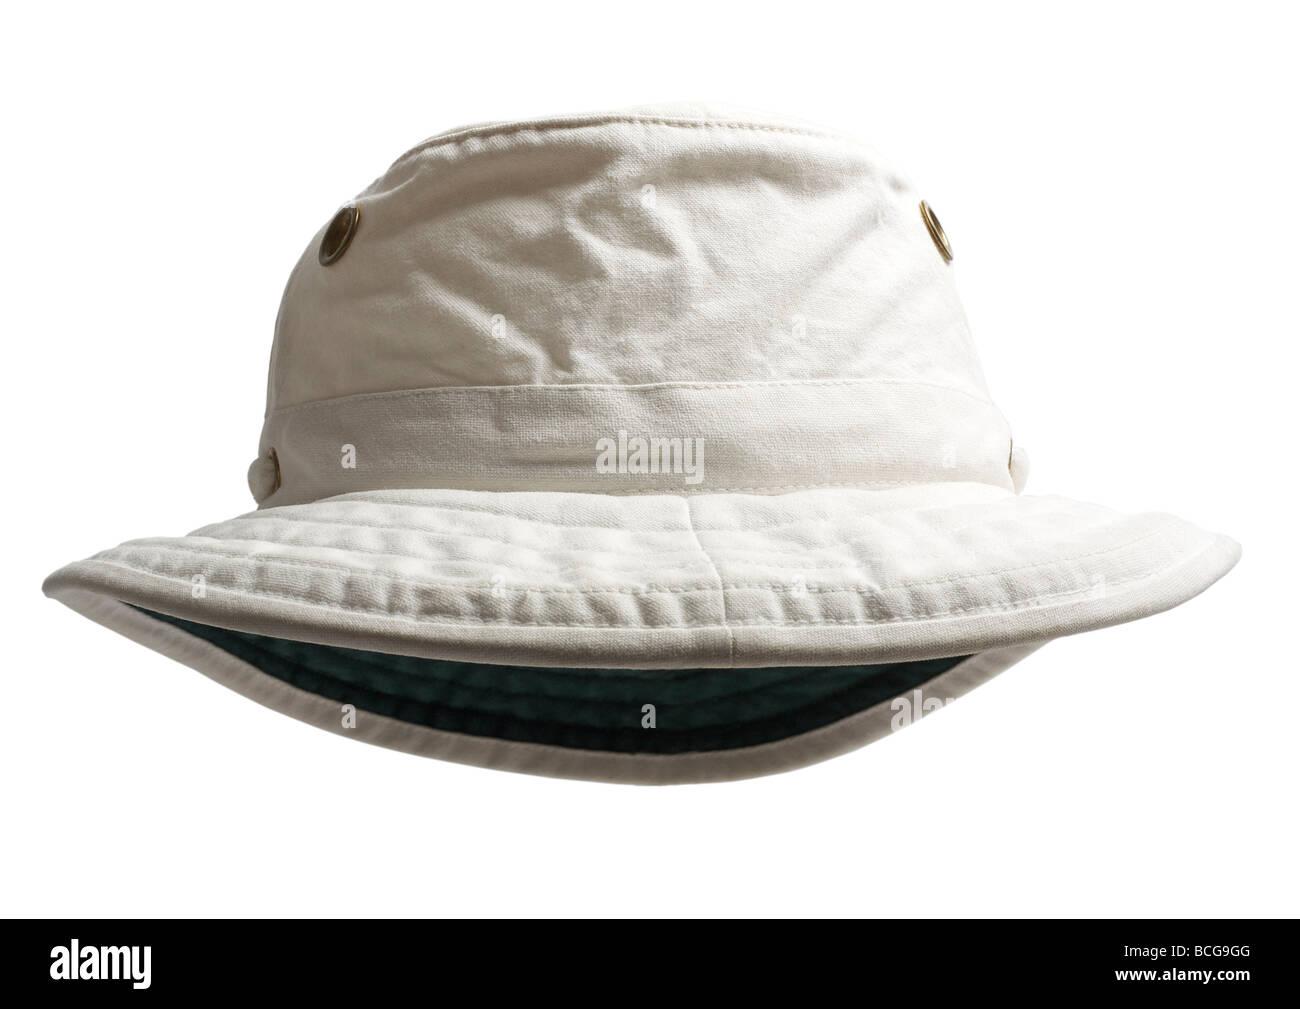 52d9da1abc842 ... order tilley hat on white background stock image 9179b 5116c